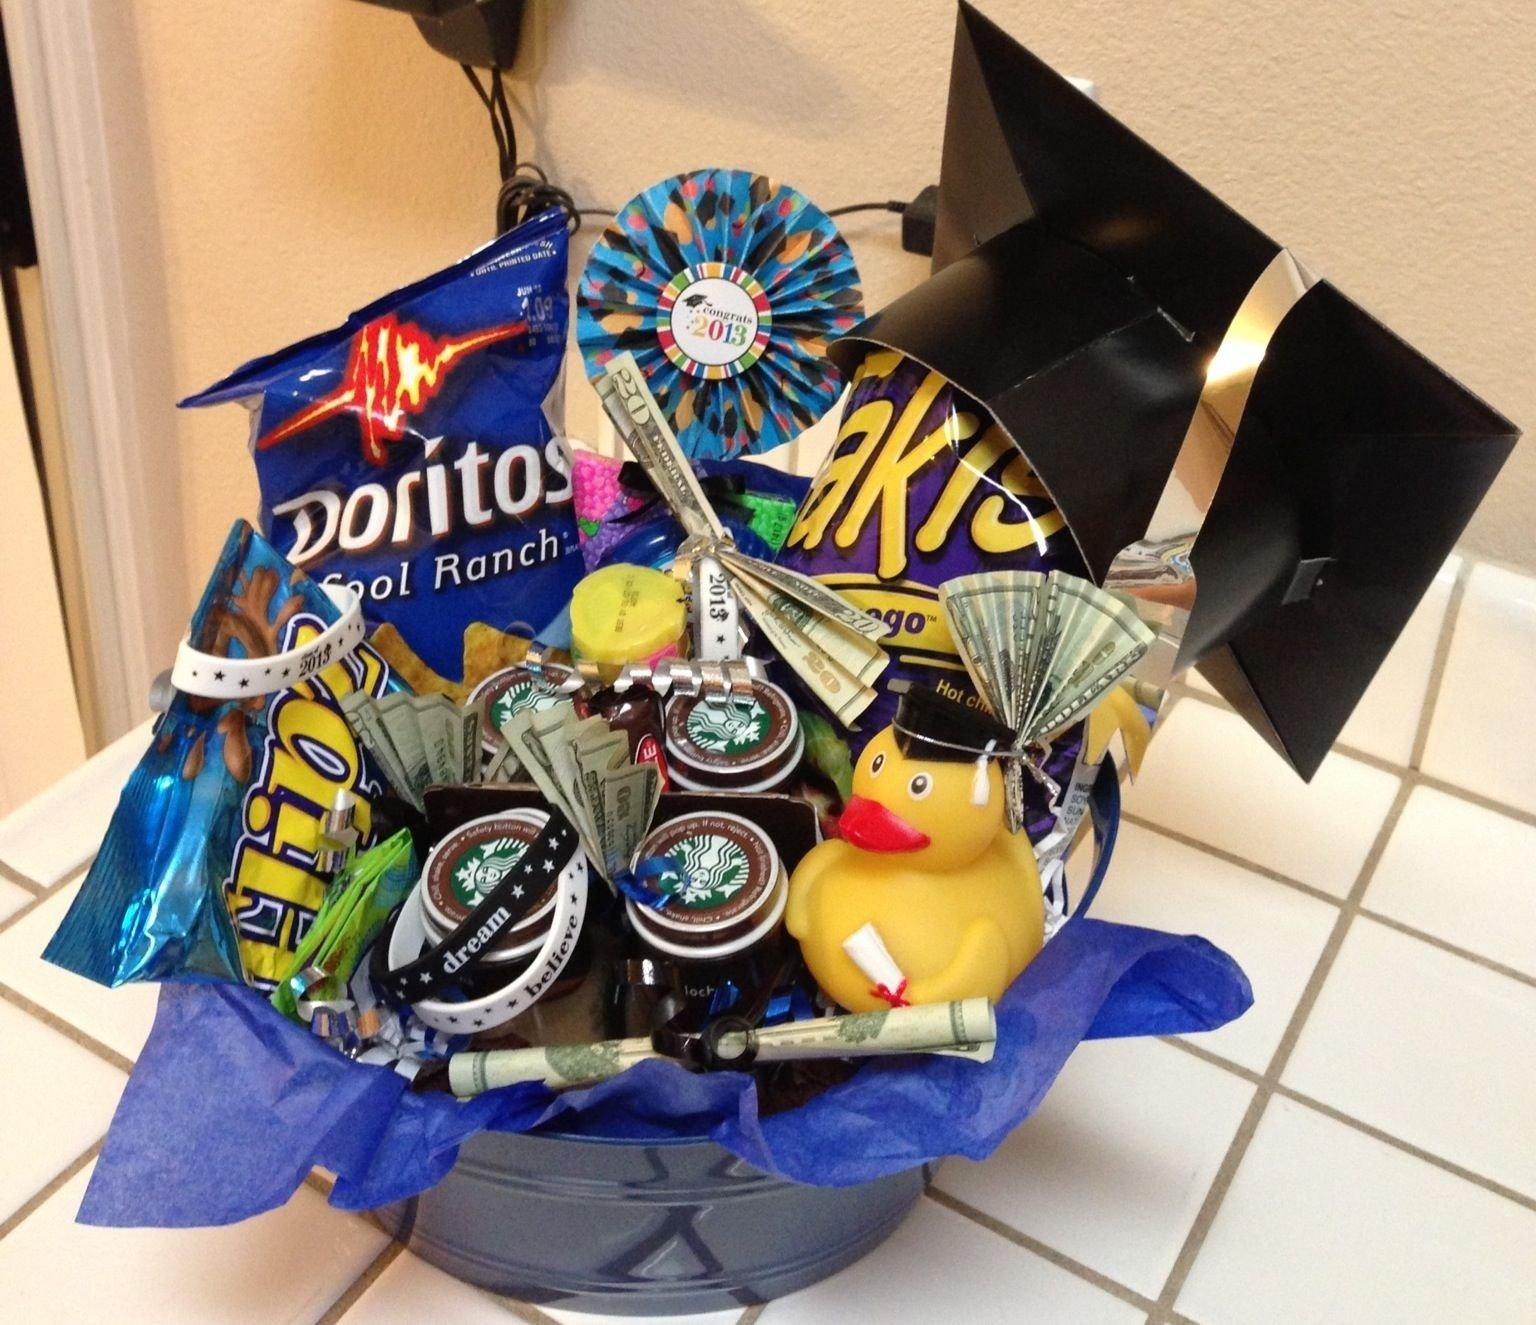 10 Wonderful Graduation Gift Ideas For Son graduation gift basket for 8th grader gift baskets pinterest 2 2021